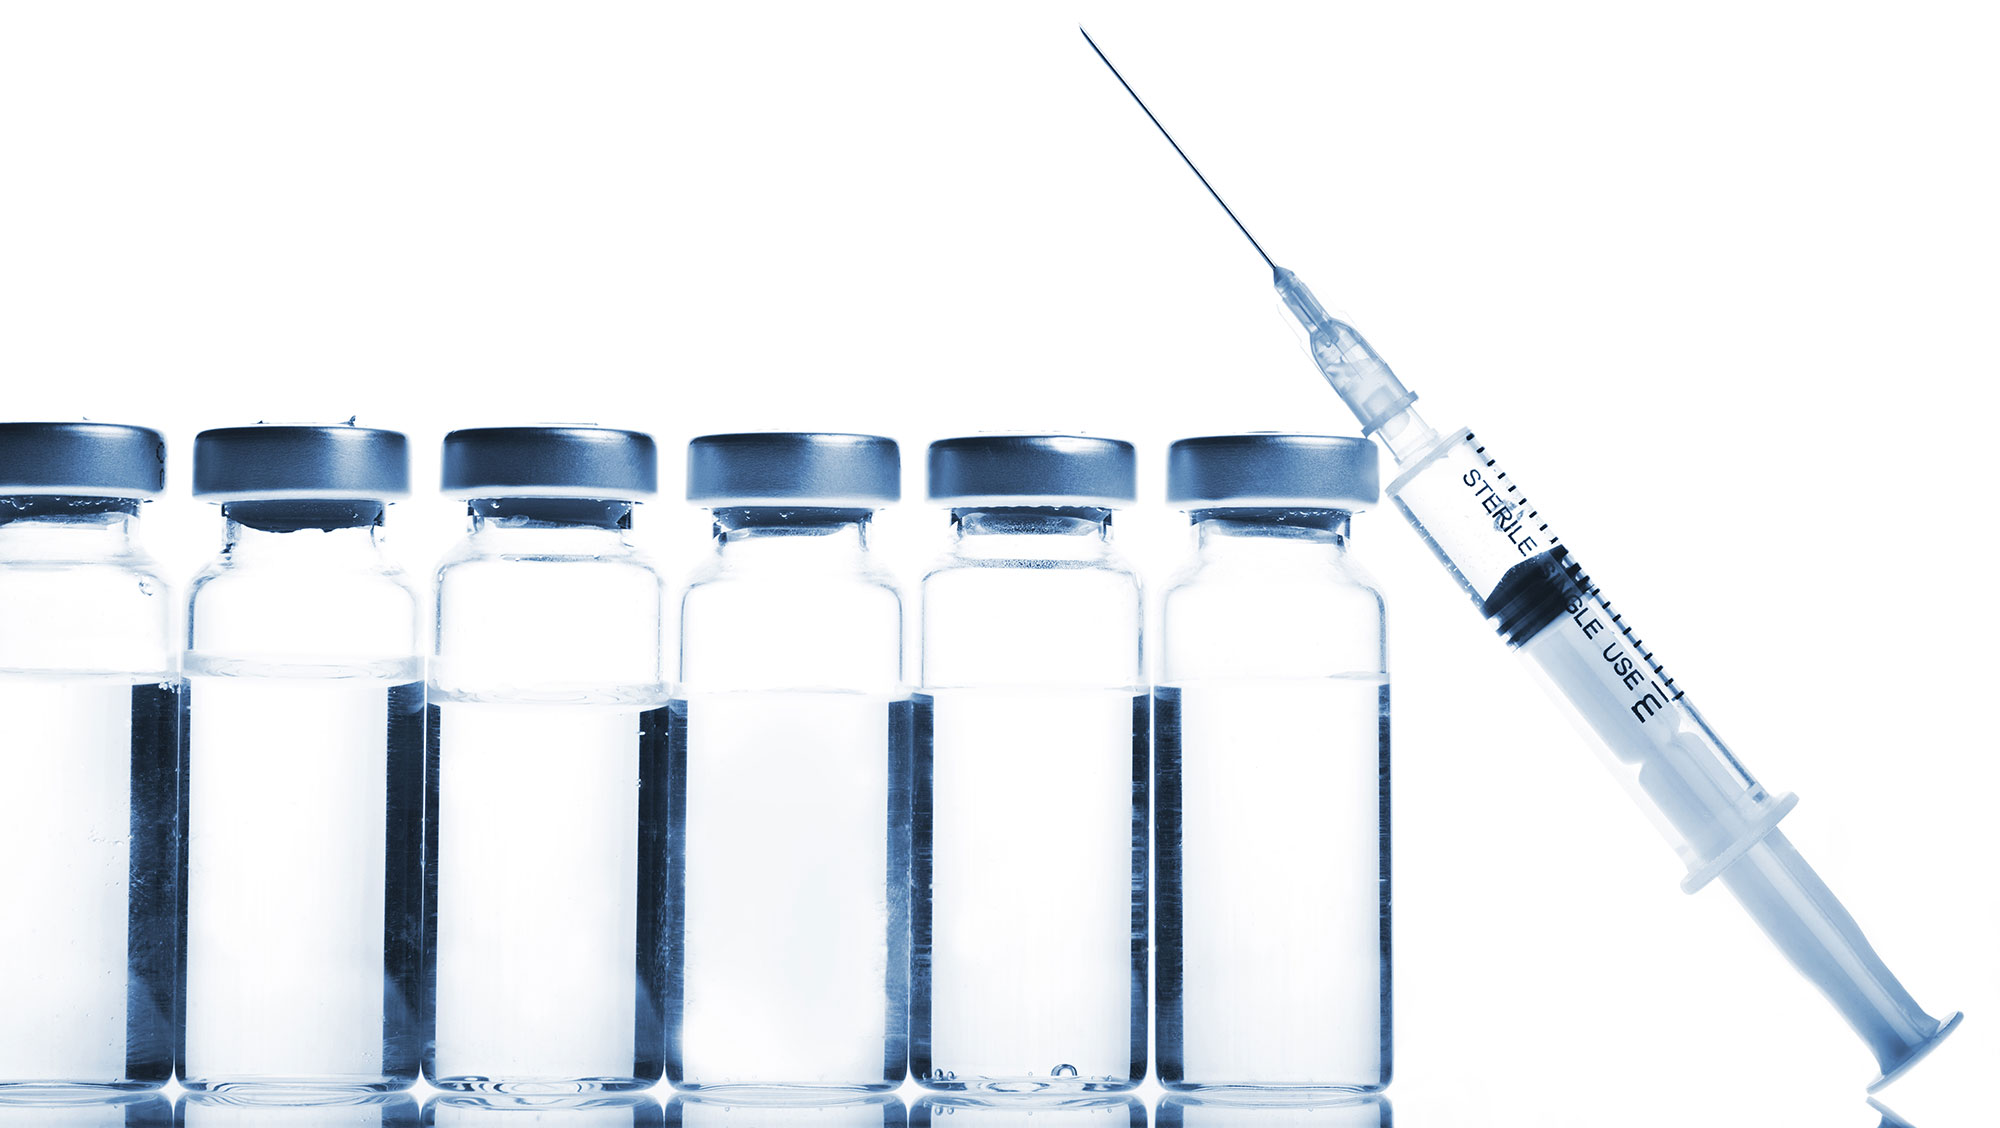 Biologic DMARDs medication